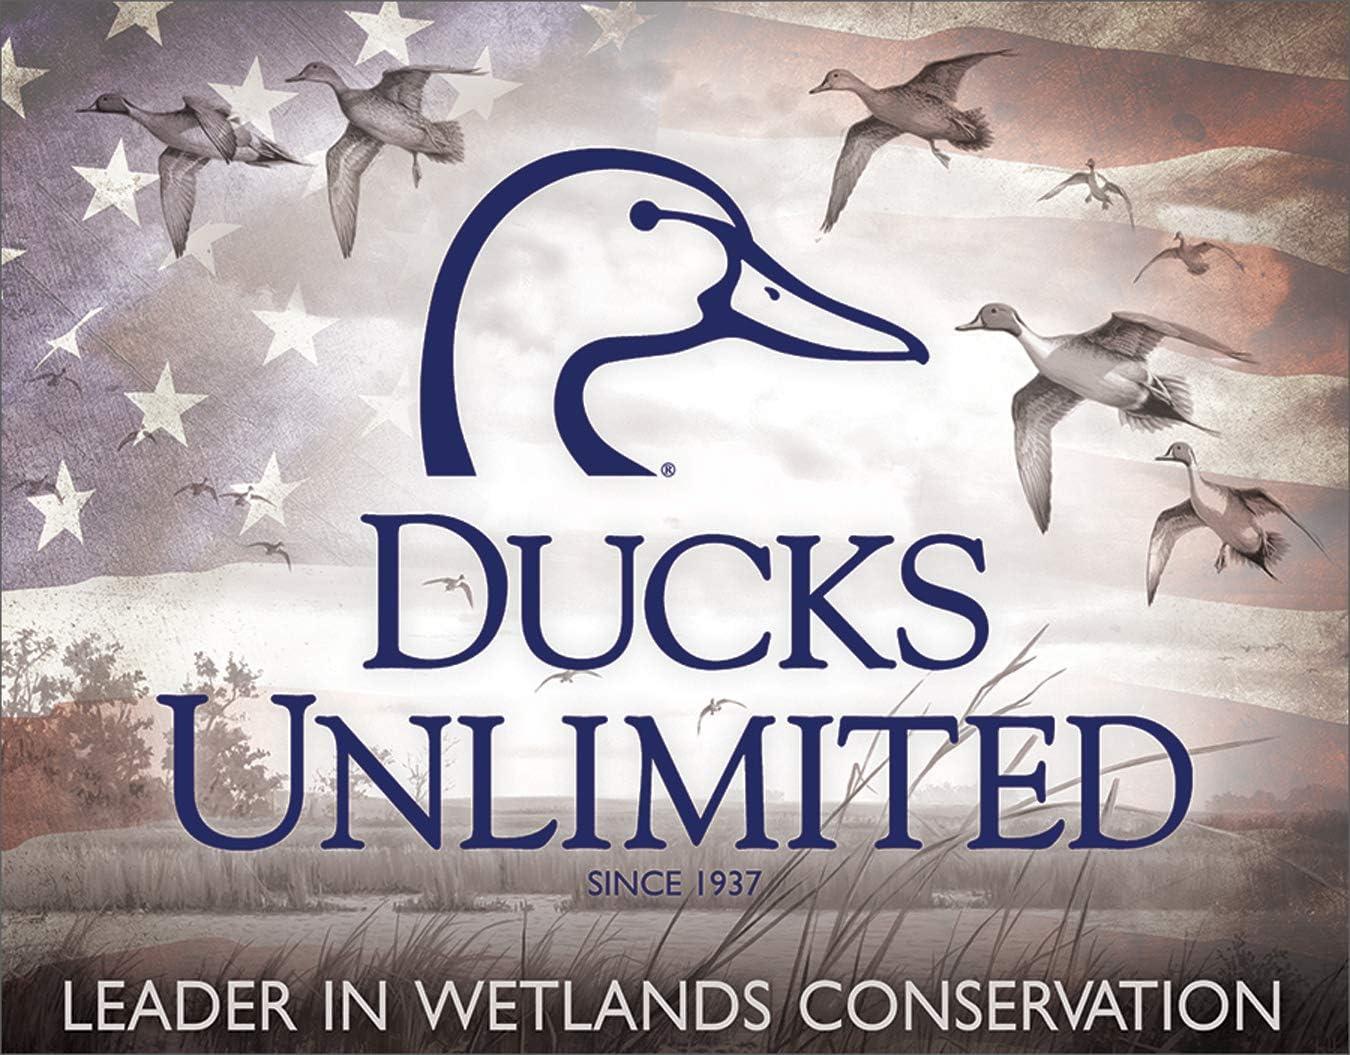 Tin Sign TSN1204 Ducks Unlimited Beaver Pond Nostalgic Emobssed Tin Signs All